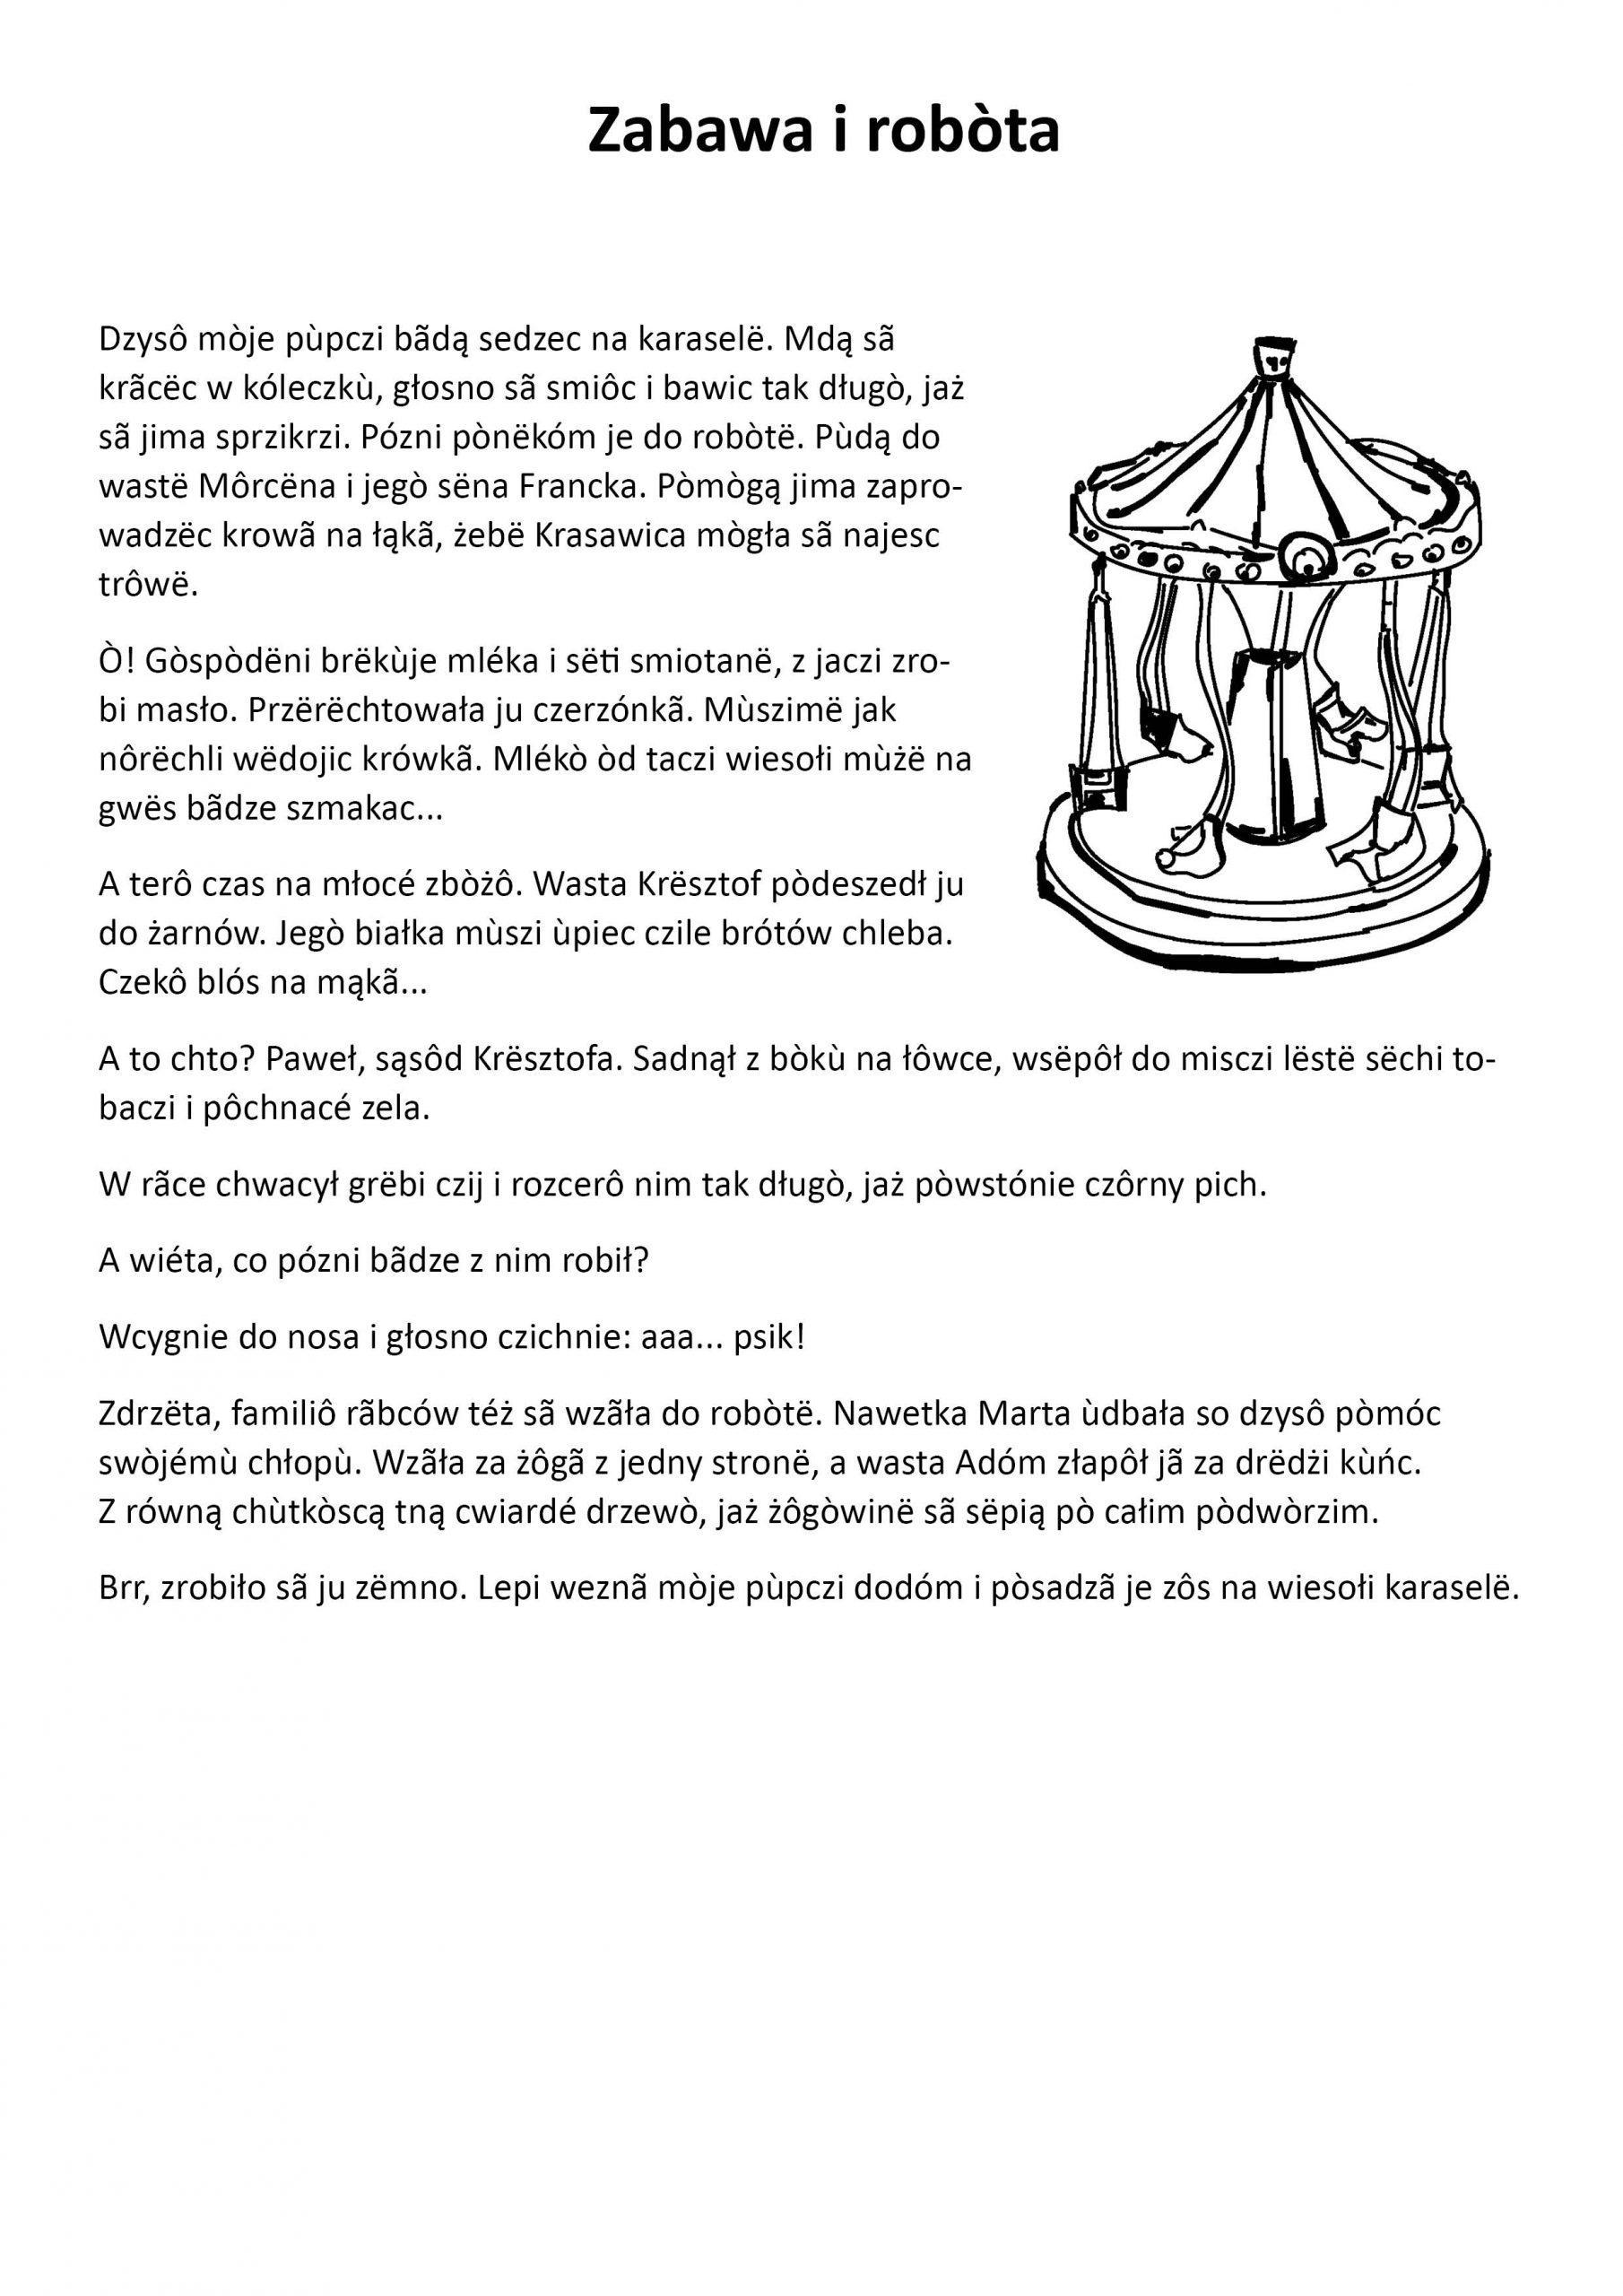 tekst opowiadania pt. Zabawa i robòta